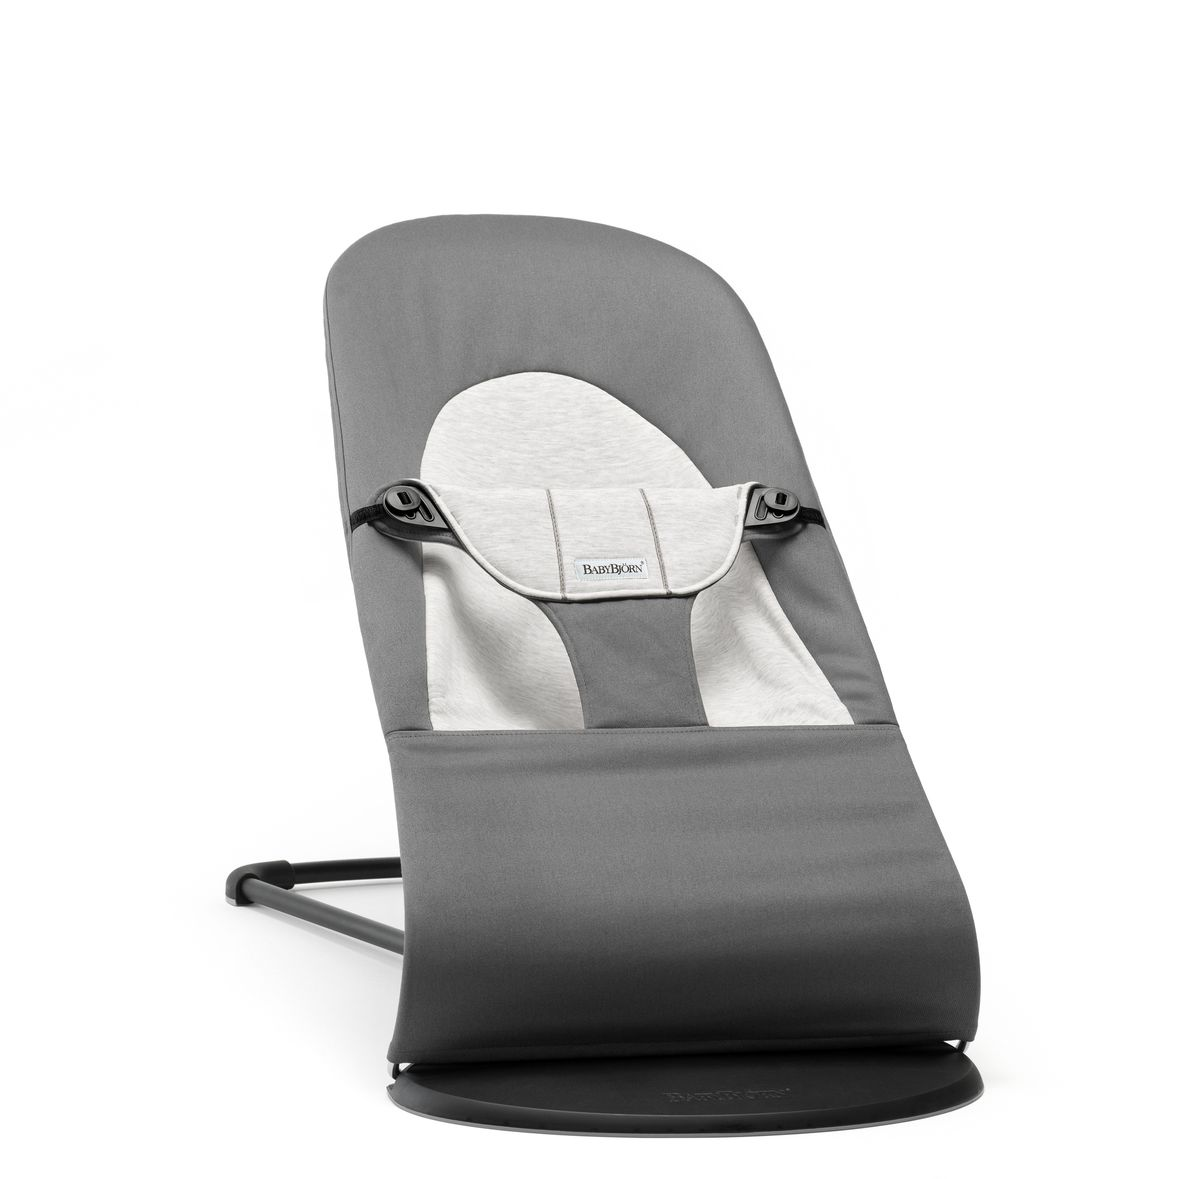 BabyBjorn Кресло-шезлонг Balance Jersey, цвет: темно-серый, серый